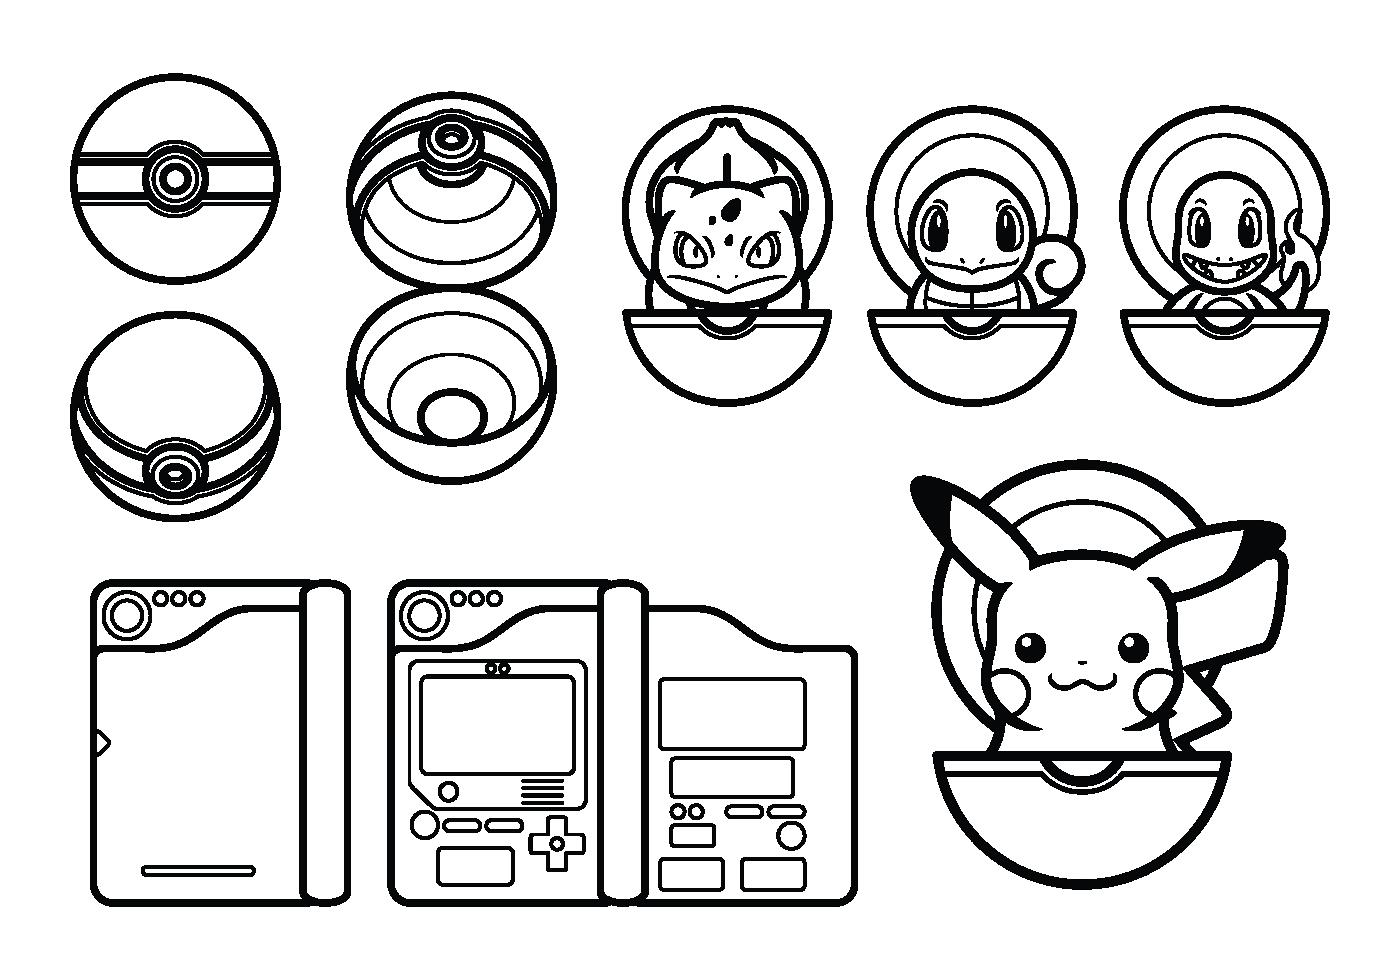 Pokemon Black And White Logo Images